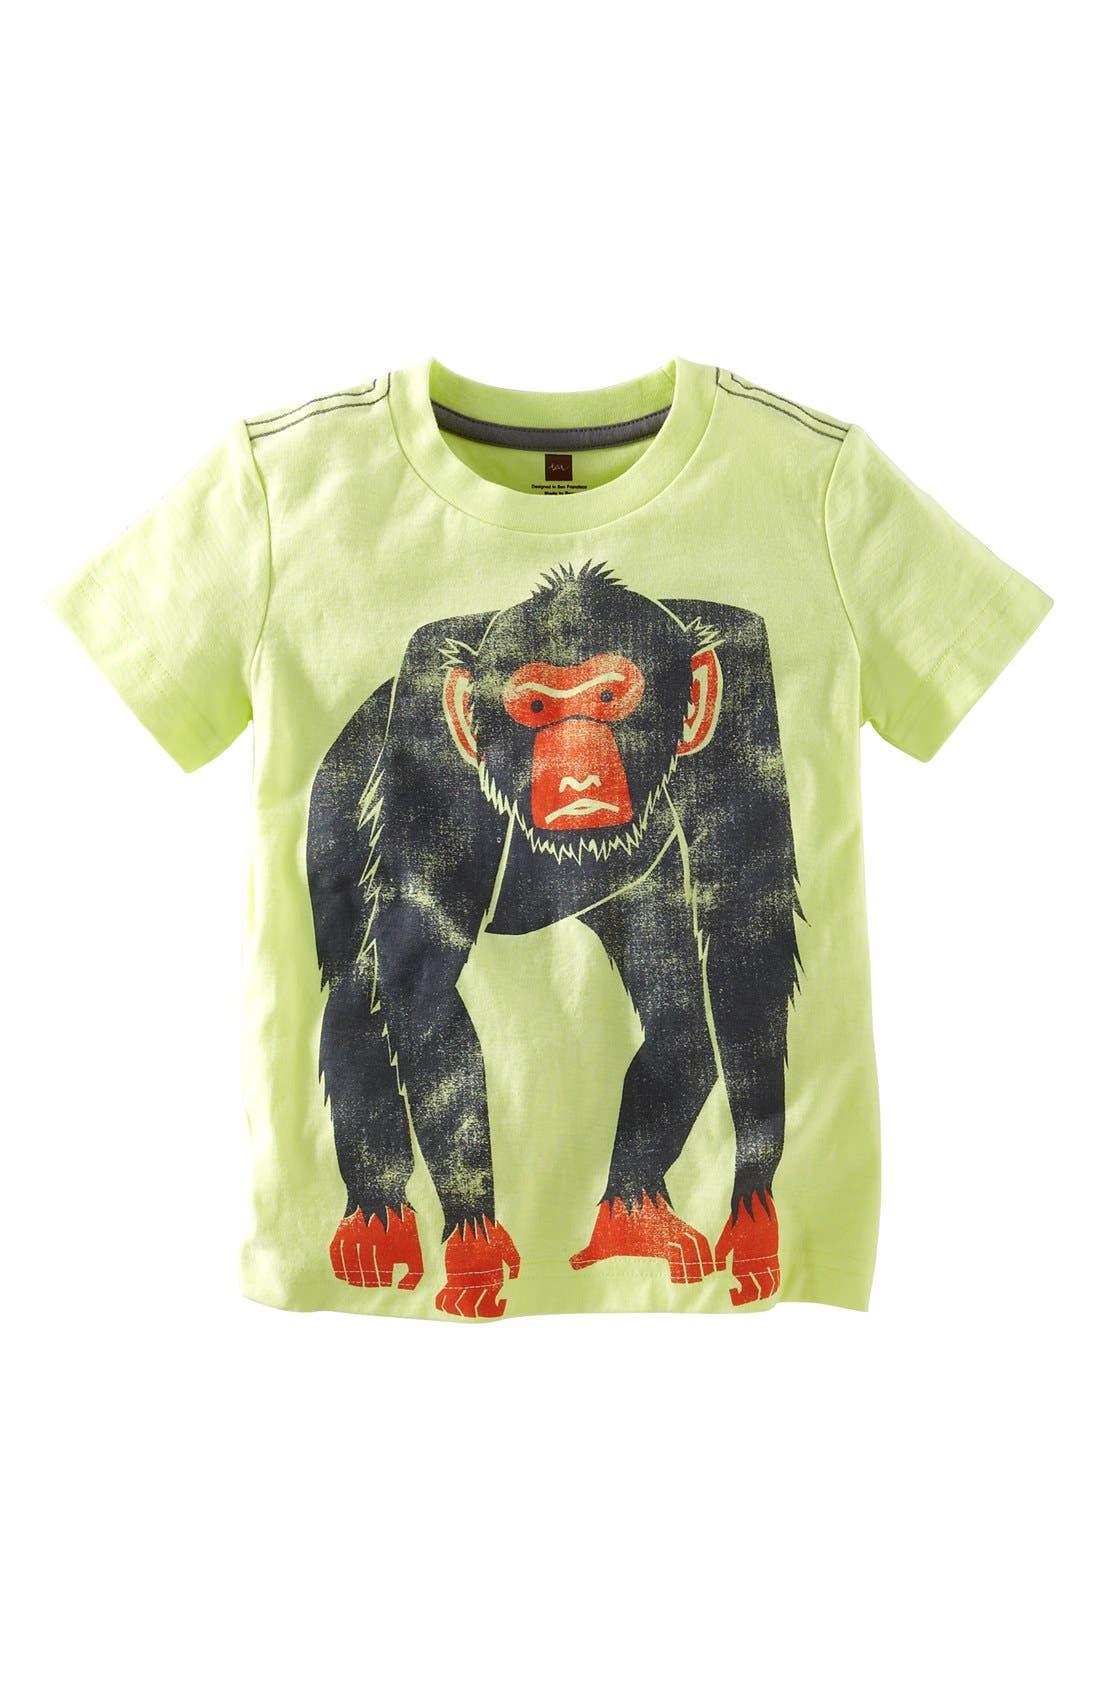 Main Image - Tea Collection 'Barbary Ape' Graphic T-Shirt (Little Boys & Big Boys)